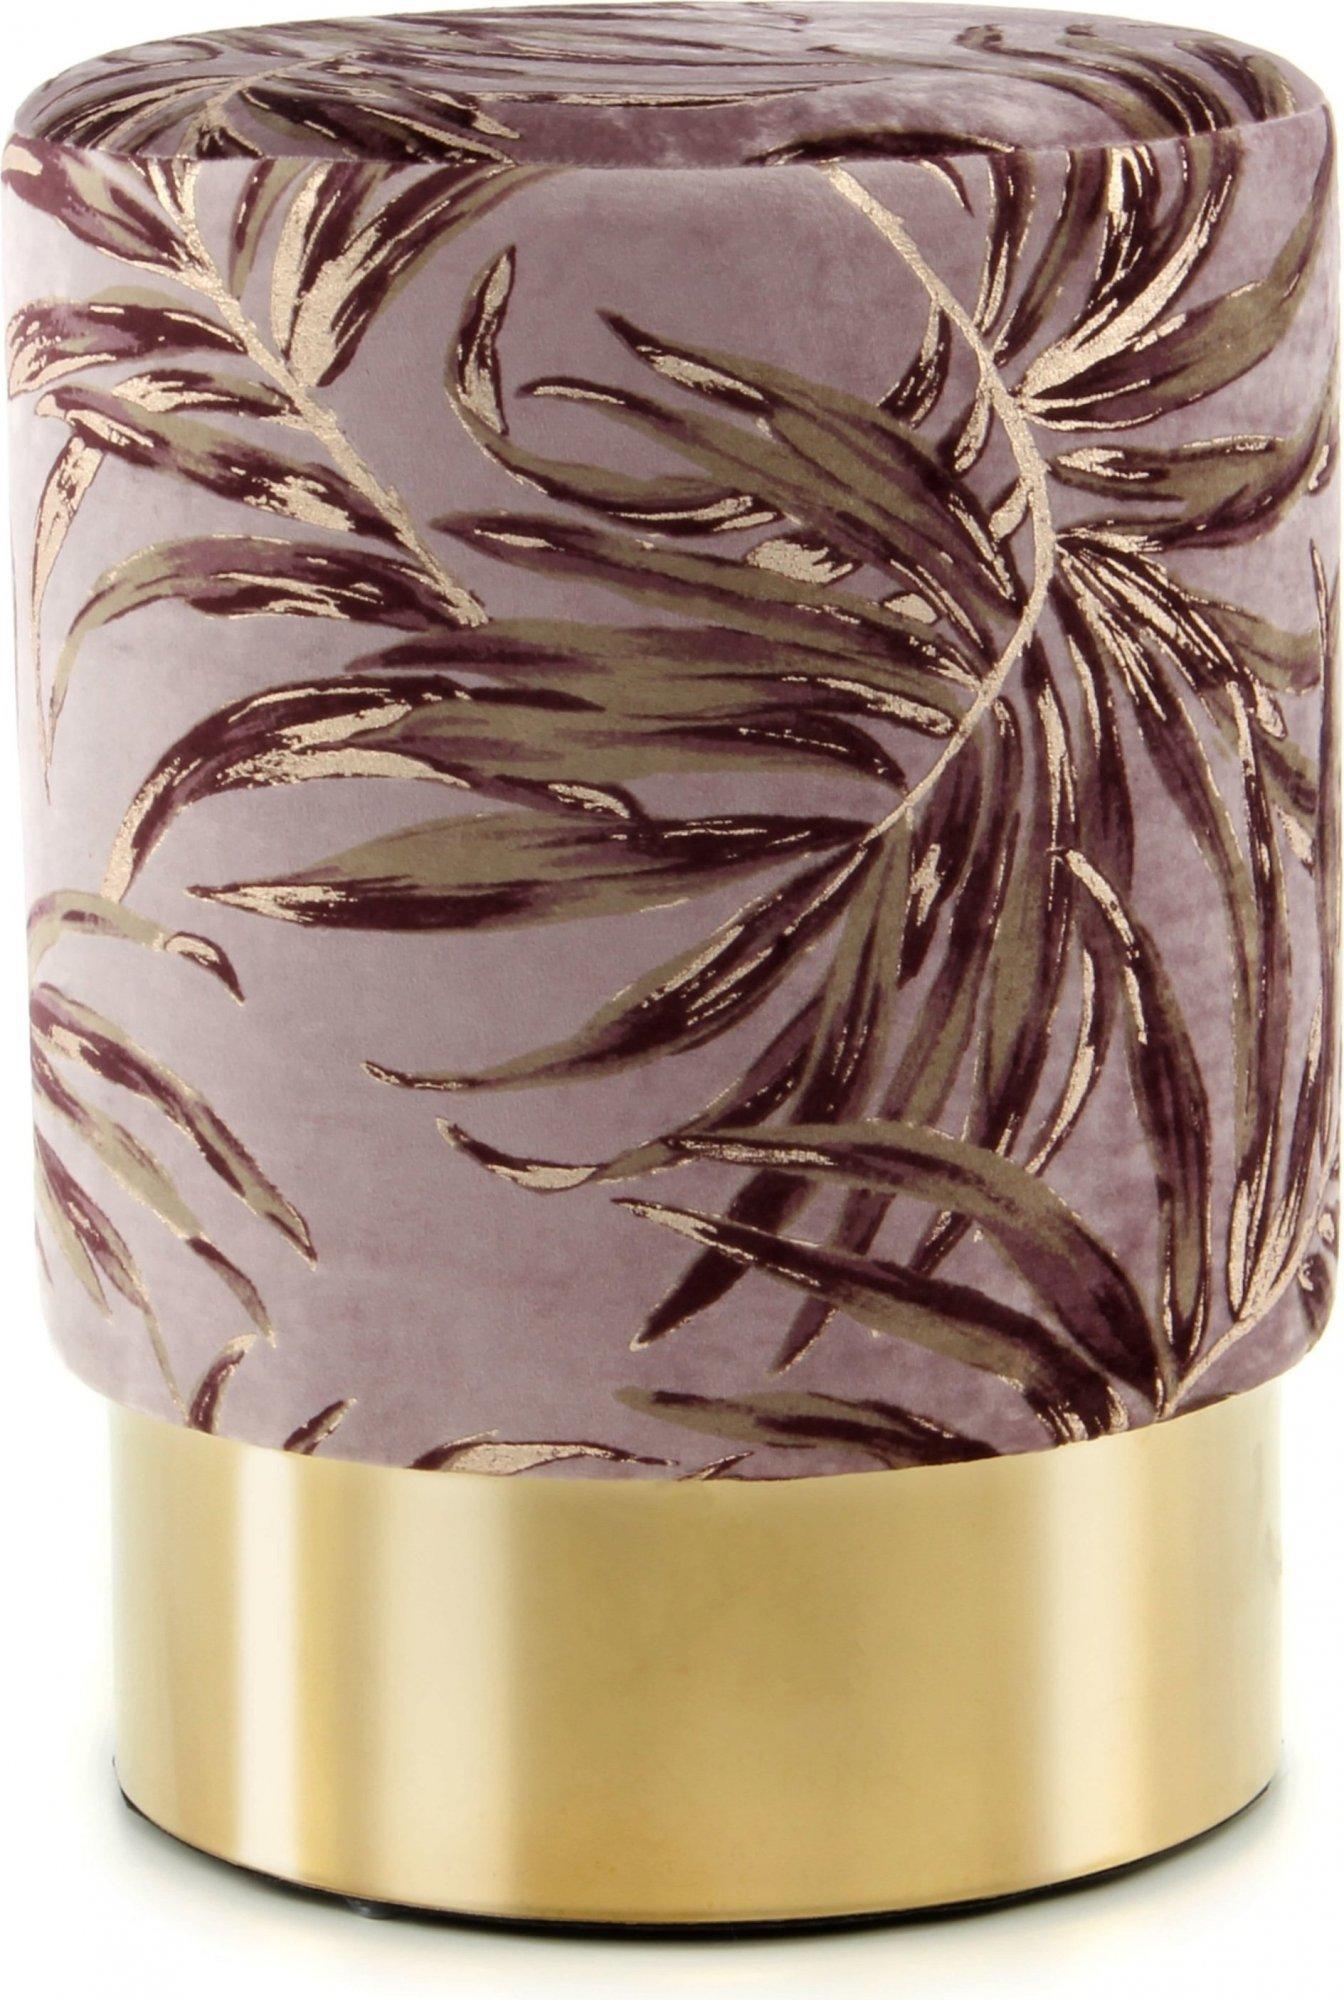 Tabouret en tissu motif feuille violet et acier doré